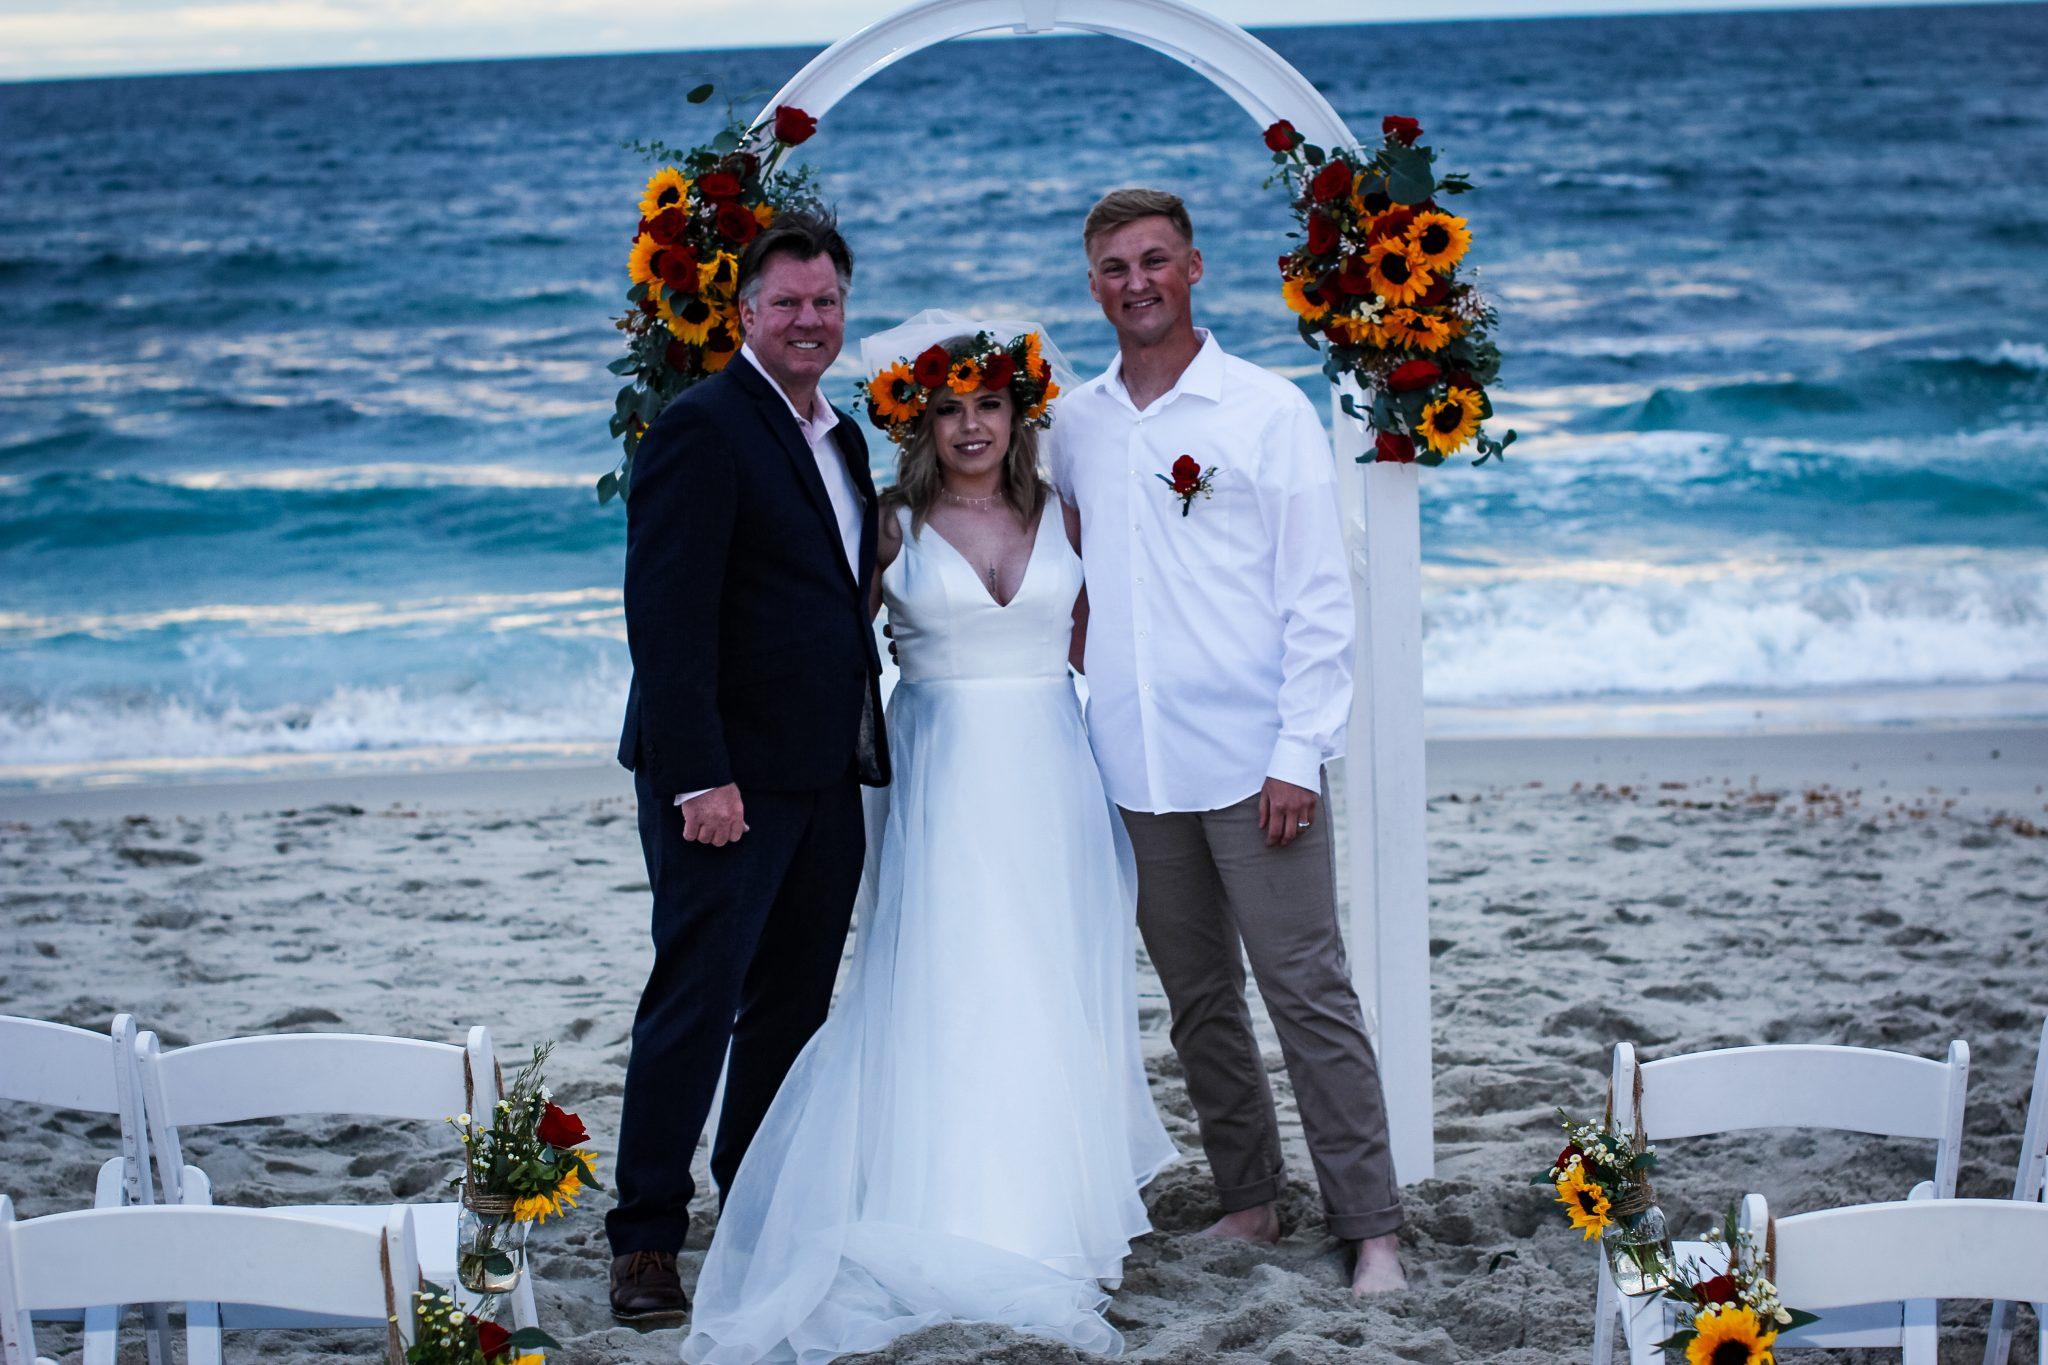 Wedding Services in San Diego, CA